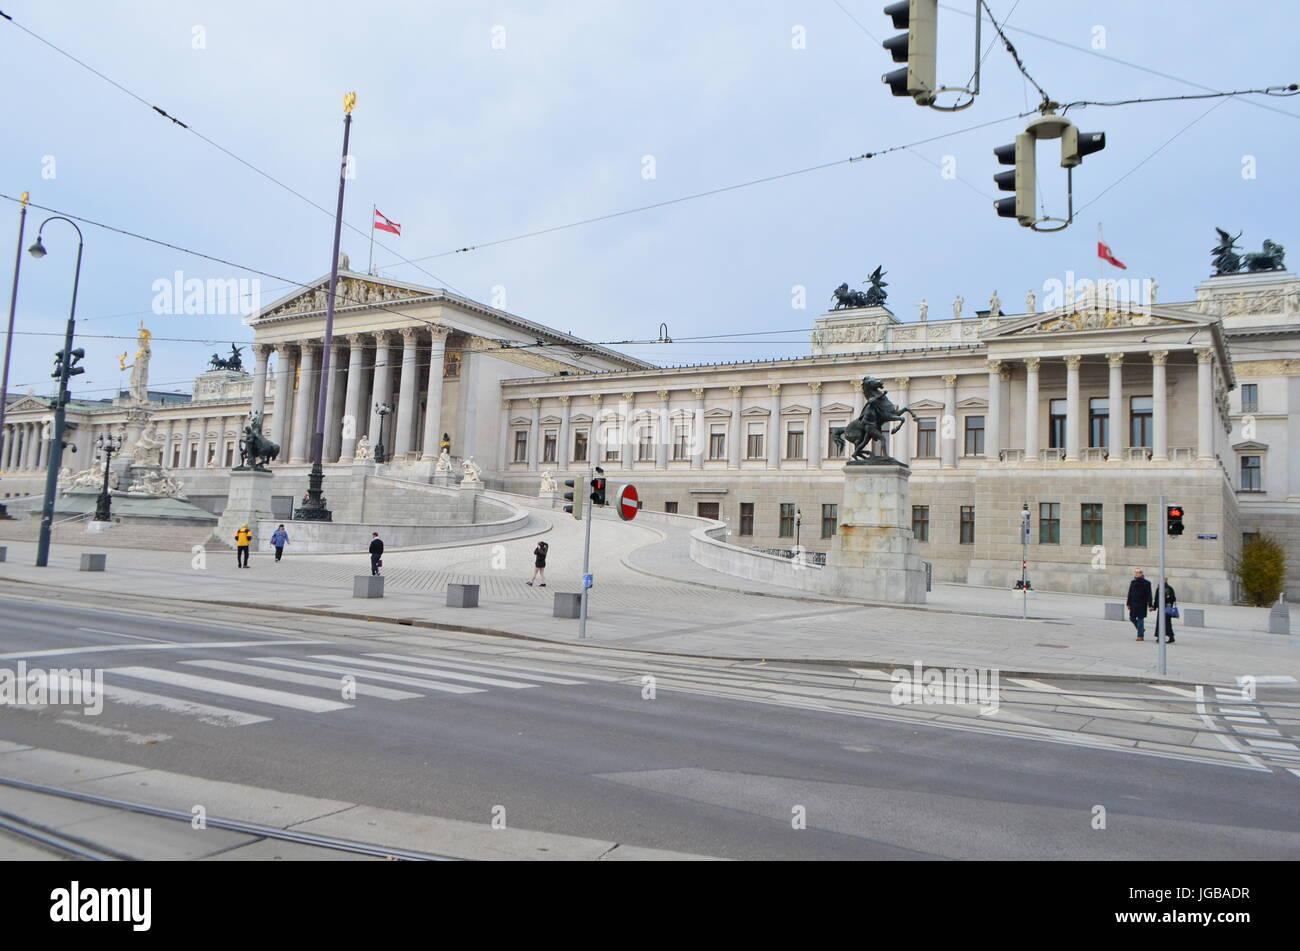 Street View of Austrian Parliament Building in Vienna, Austria Stock Photo